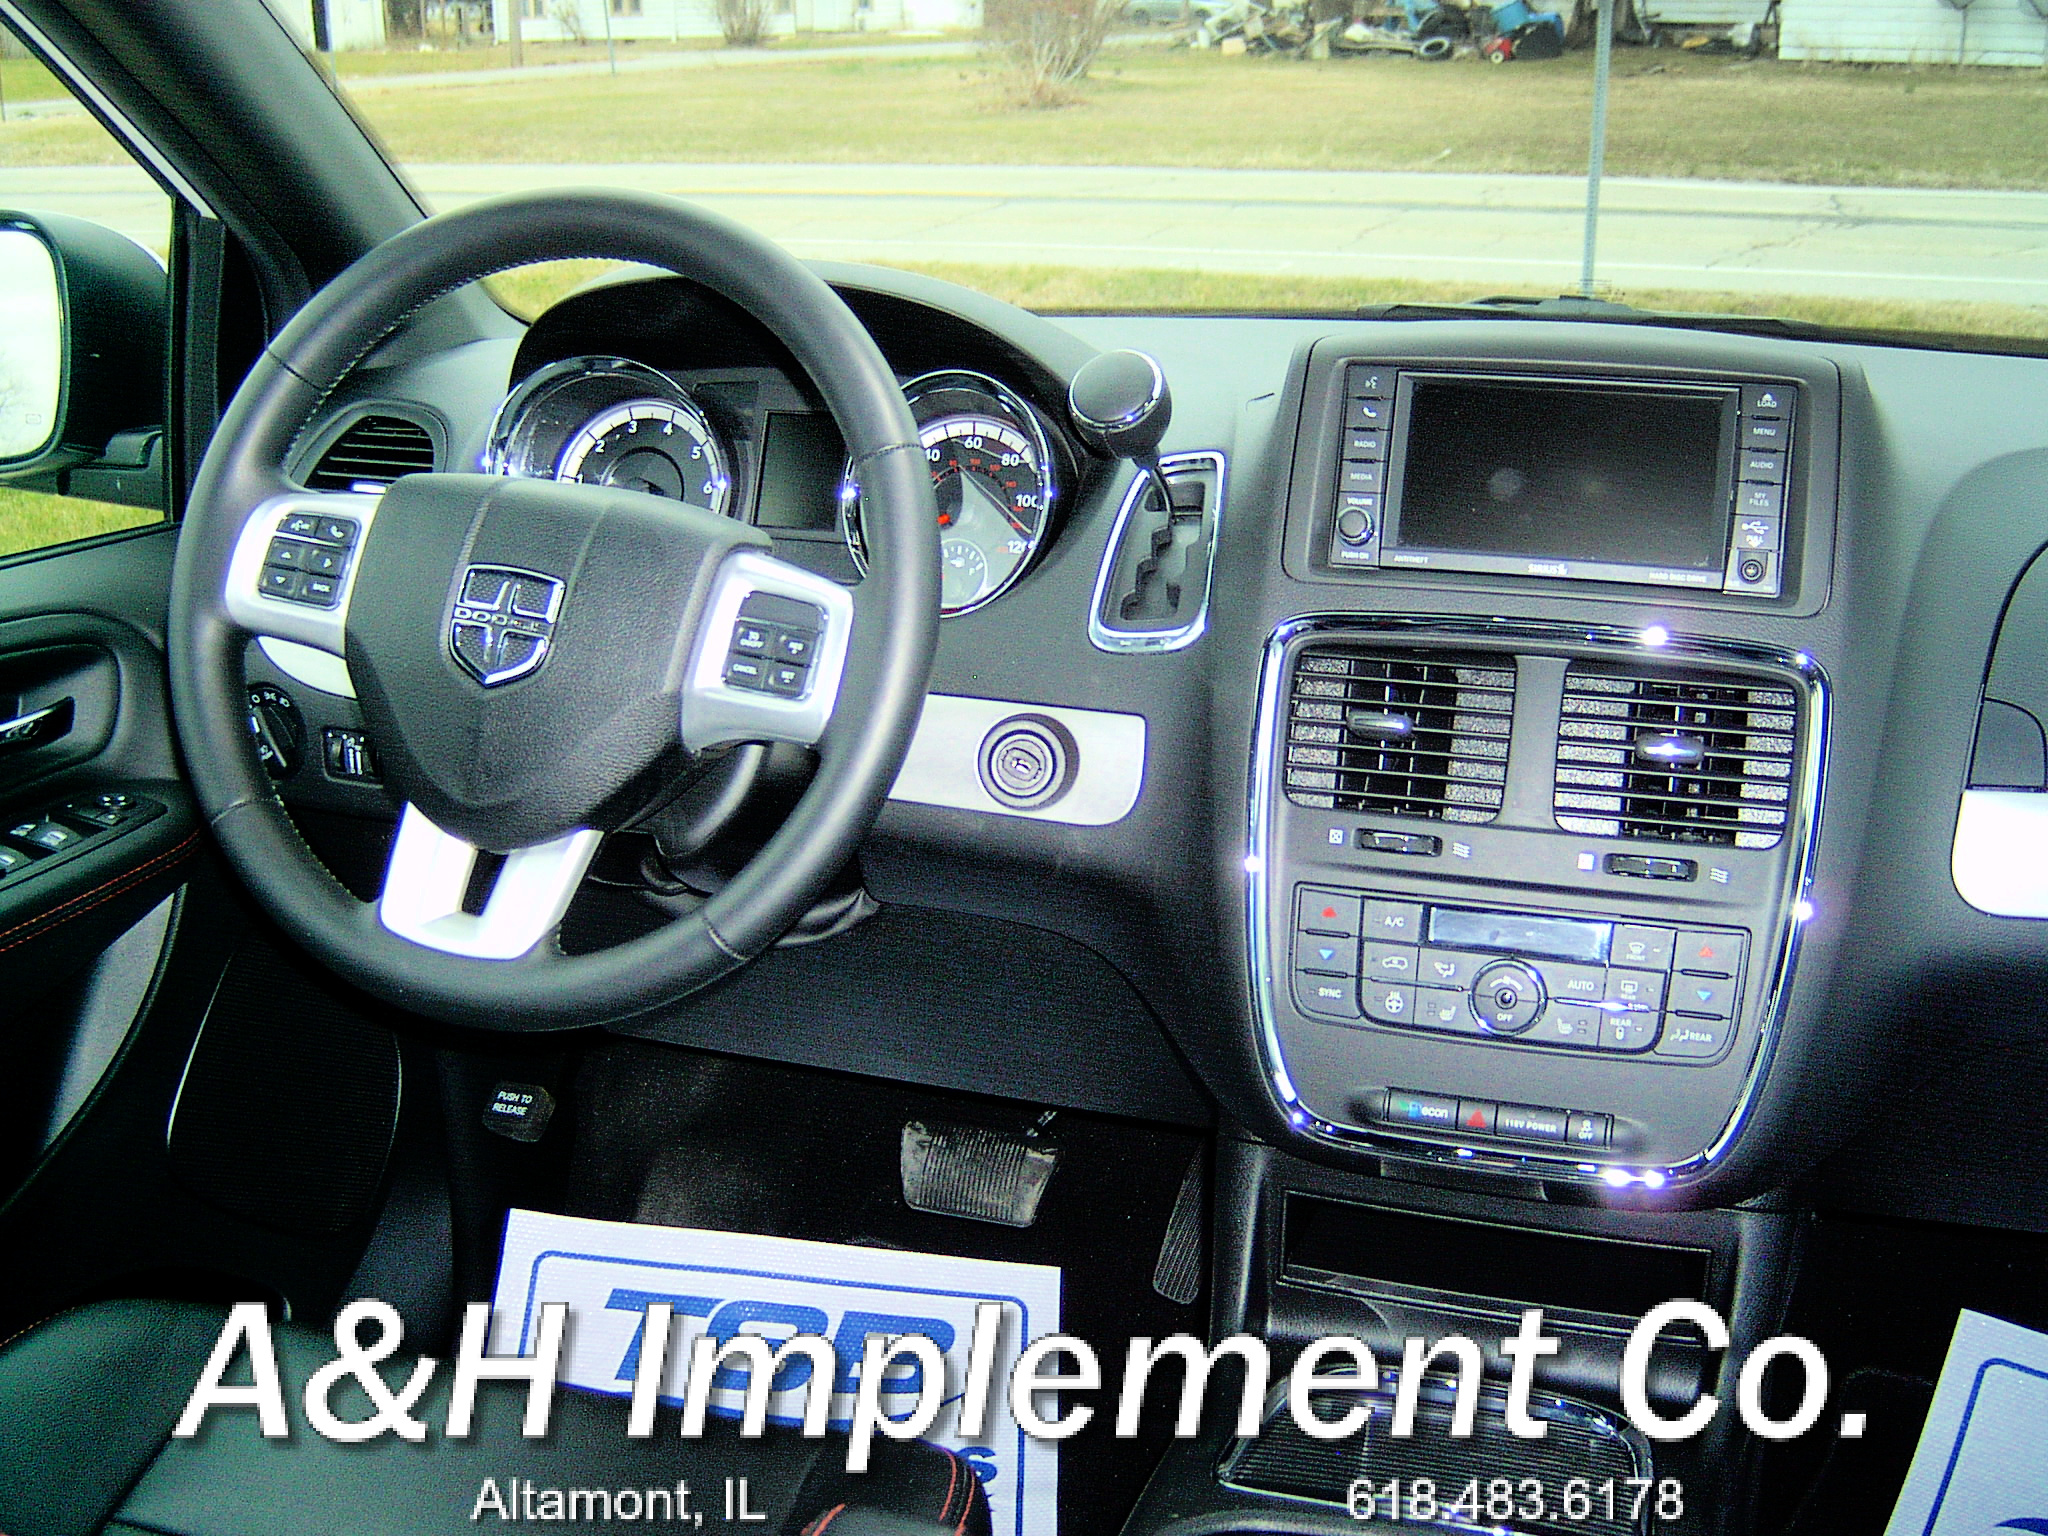 2020 Dodge Grand Caravan GT - White 3